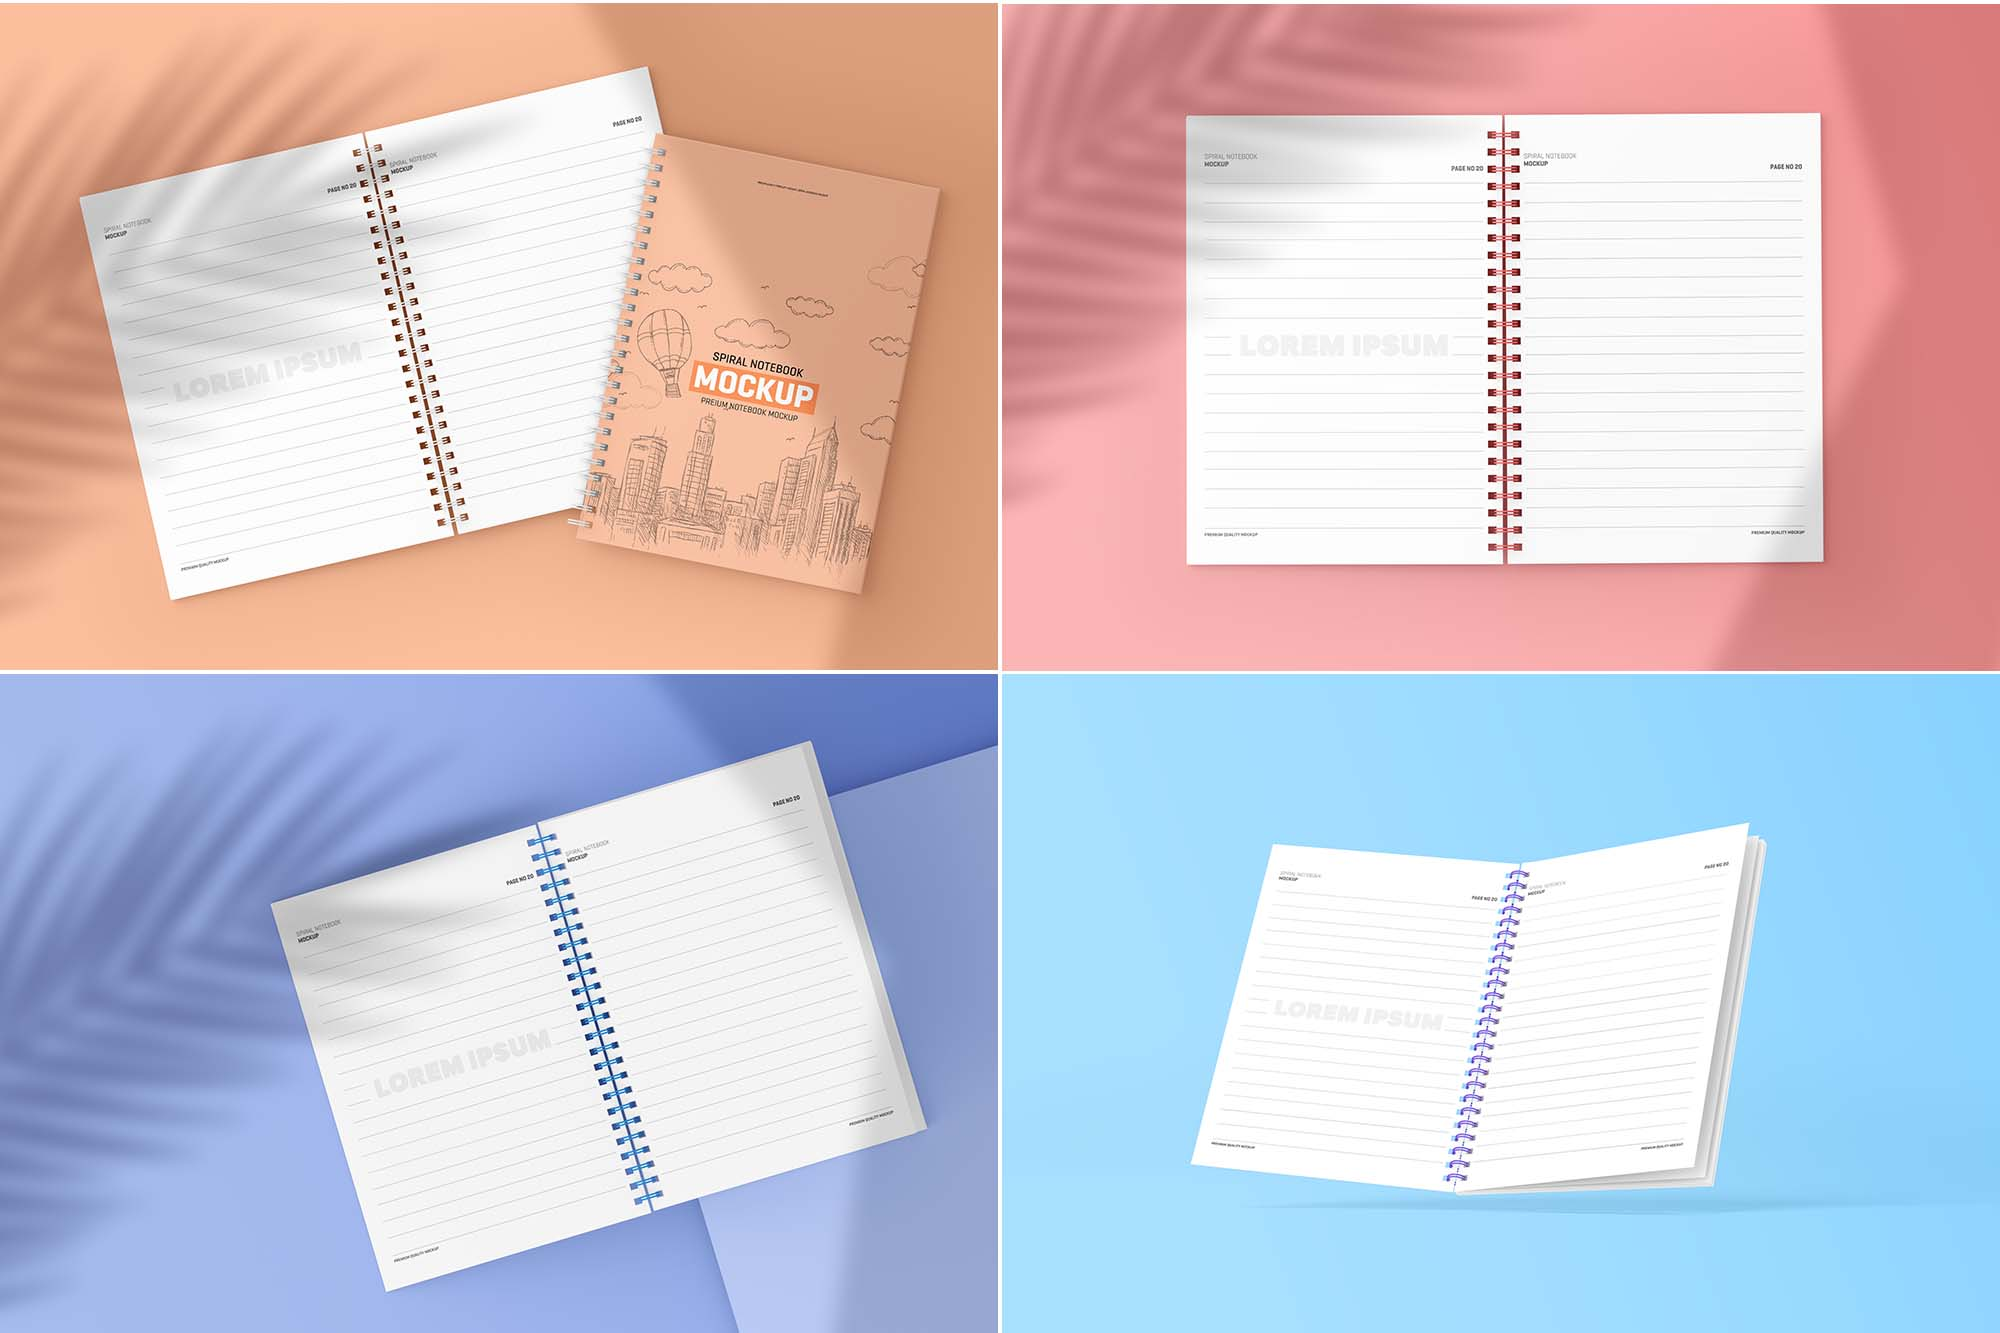 Spiral Notebook Mockup - Premium 2